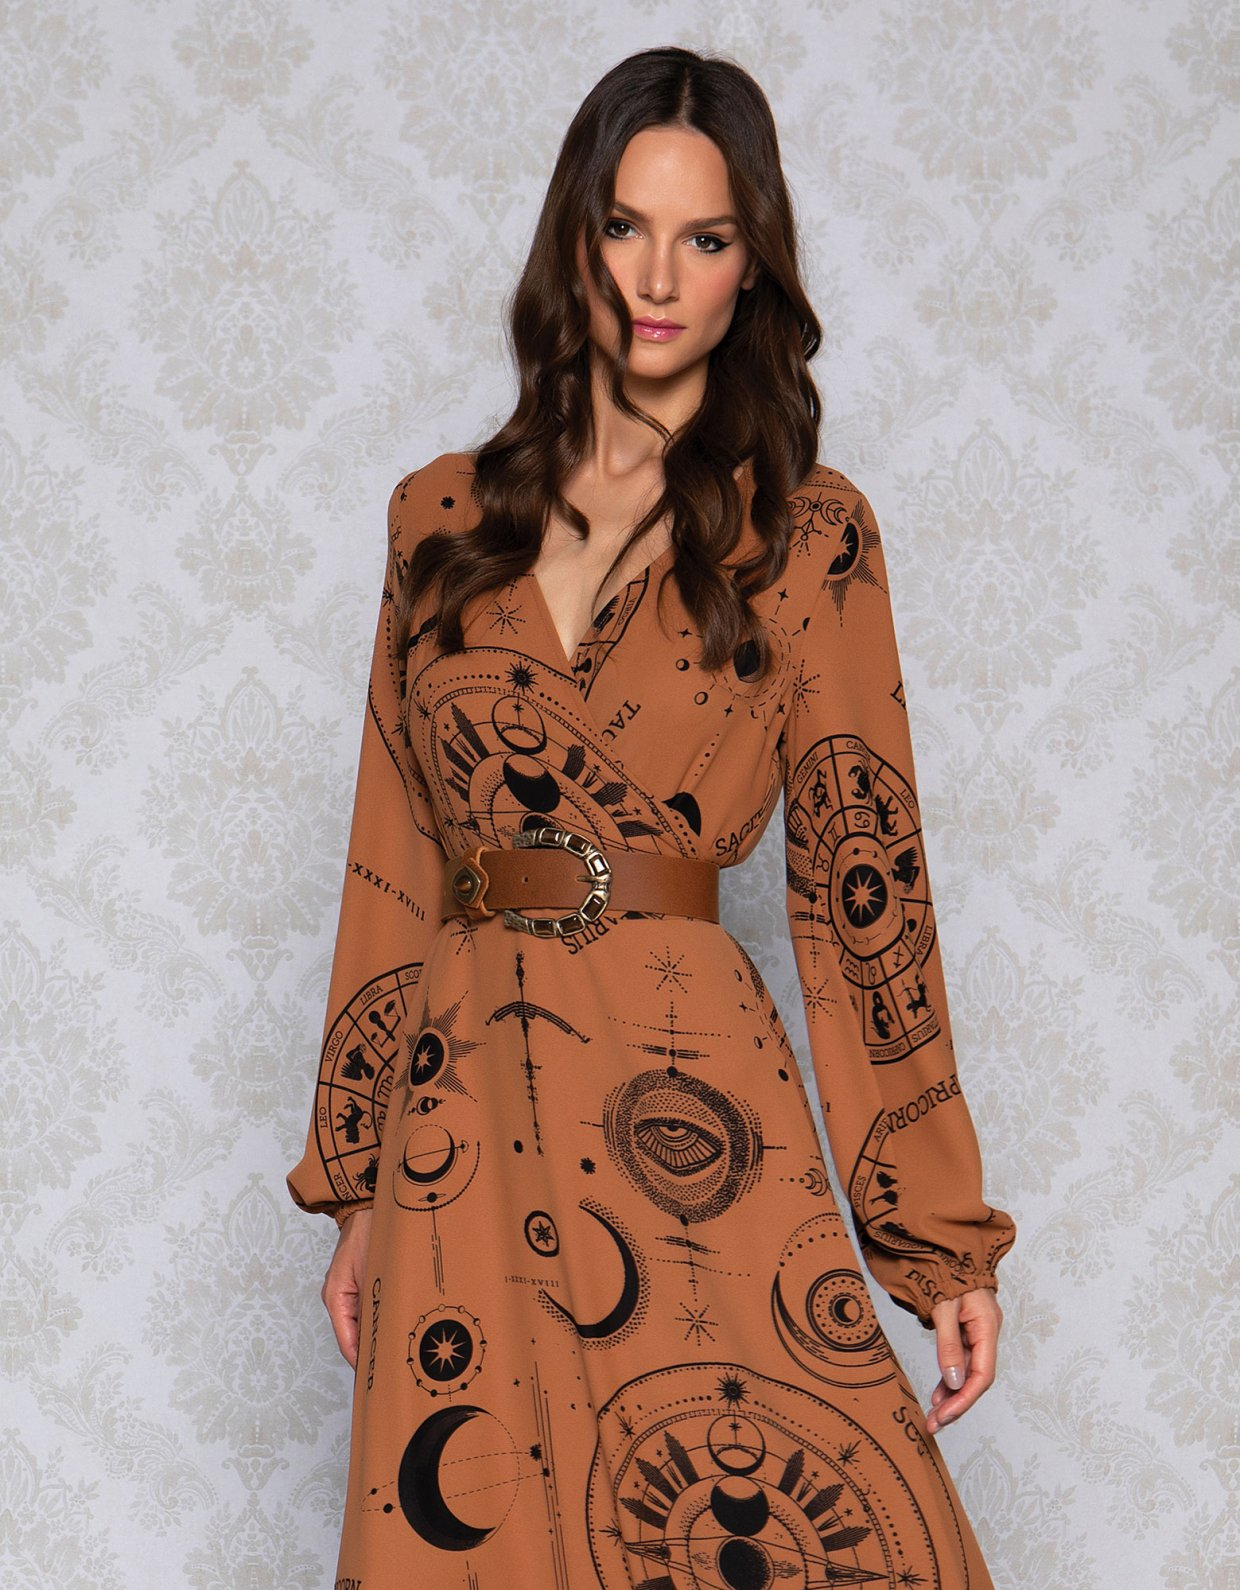 Peace & Chaos La luna wrap maxi dress